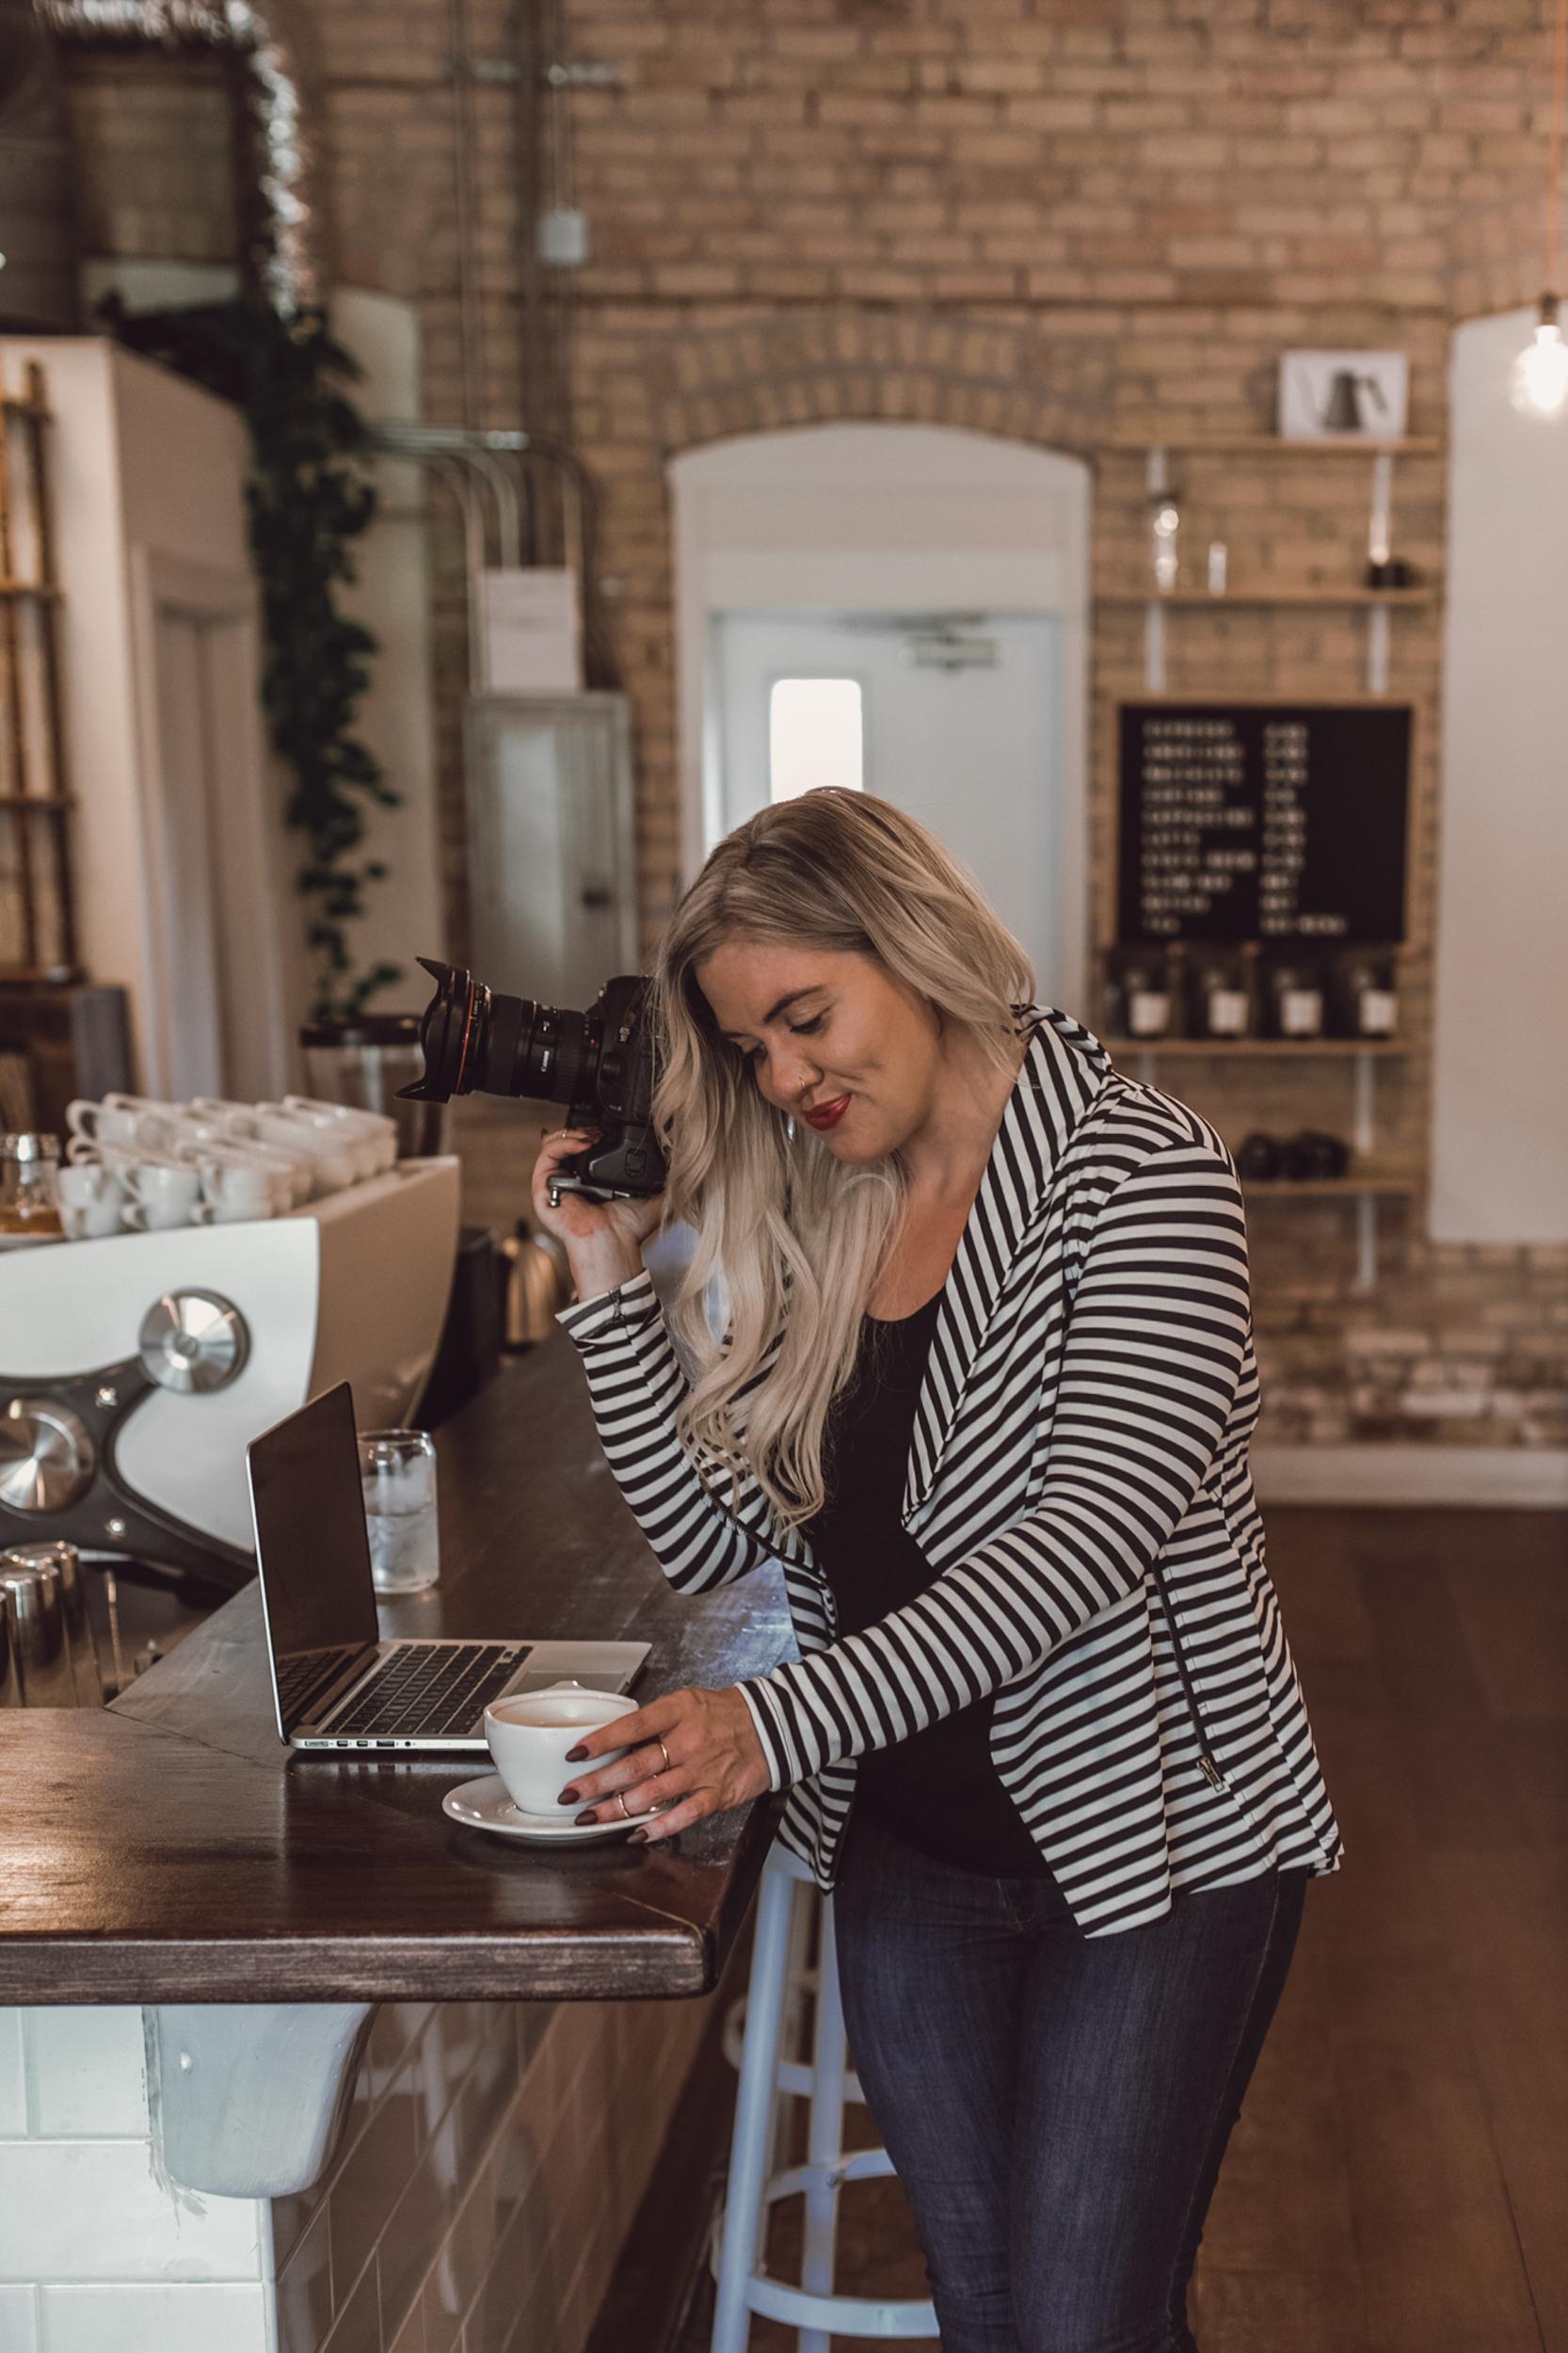 rachel-smak-wesley-andrews-coffee-shop-2.jpg